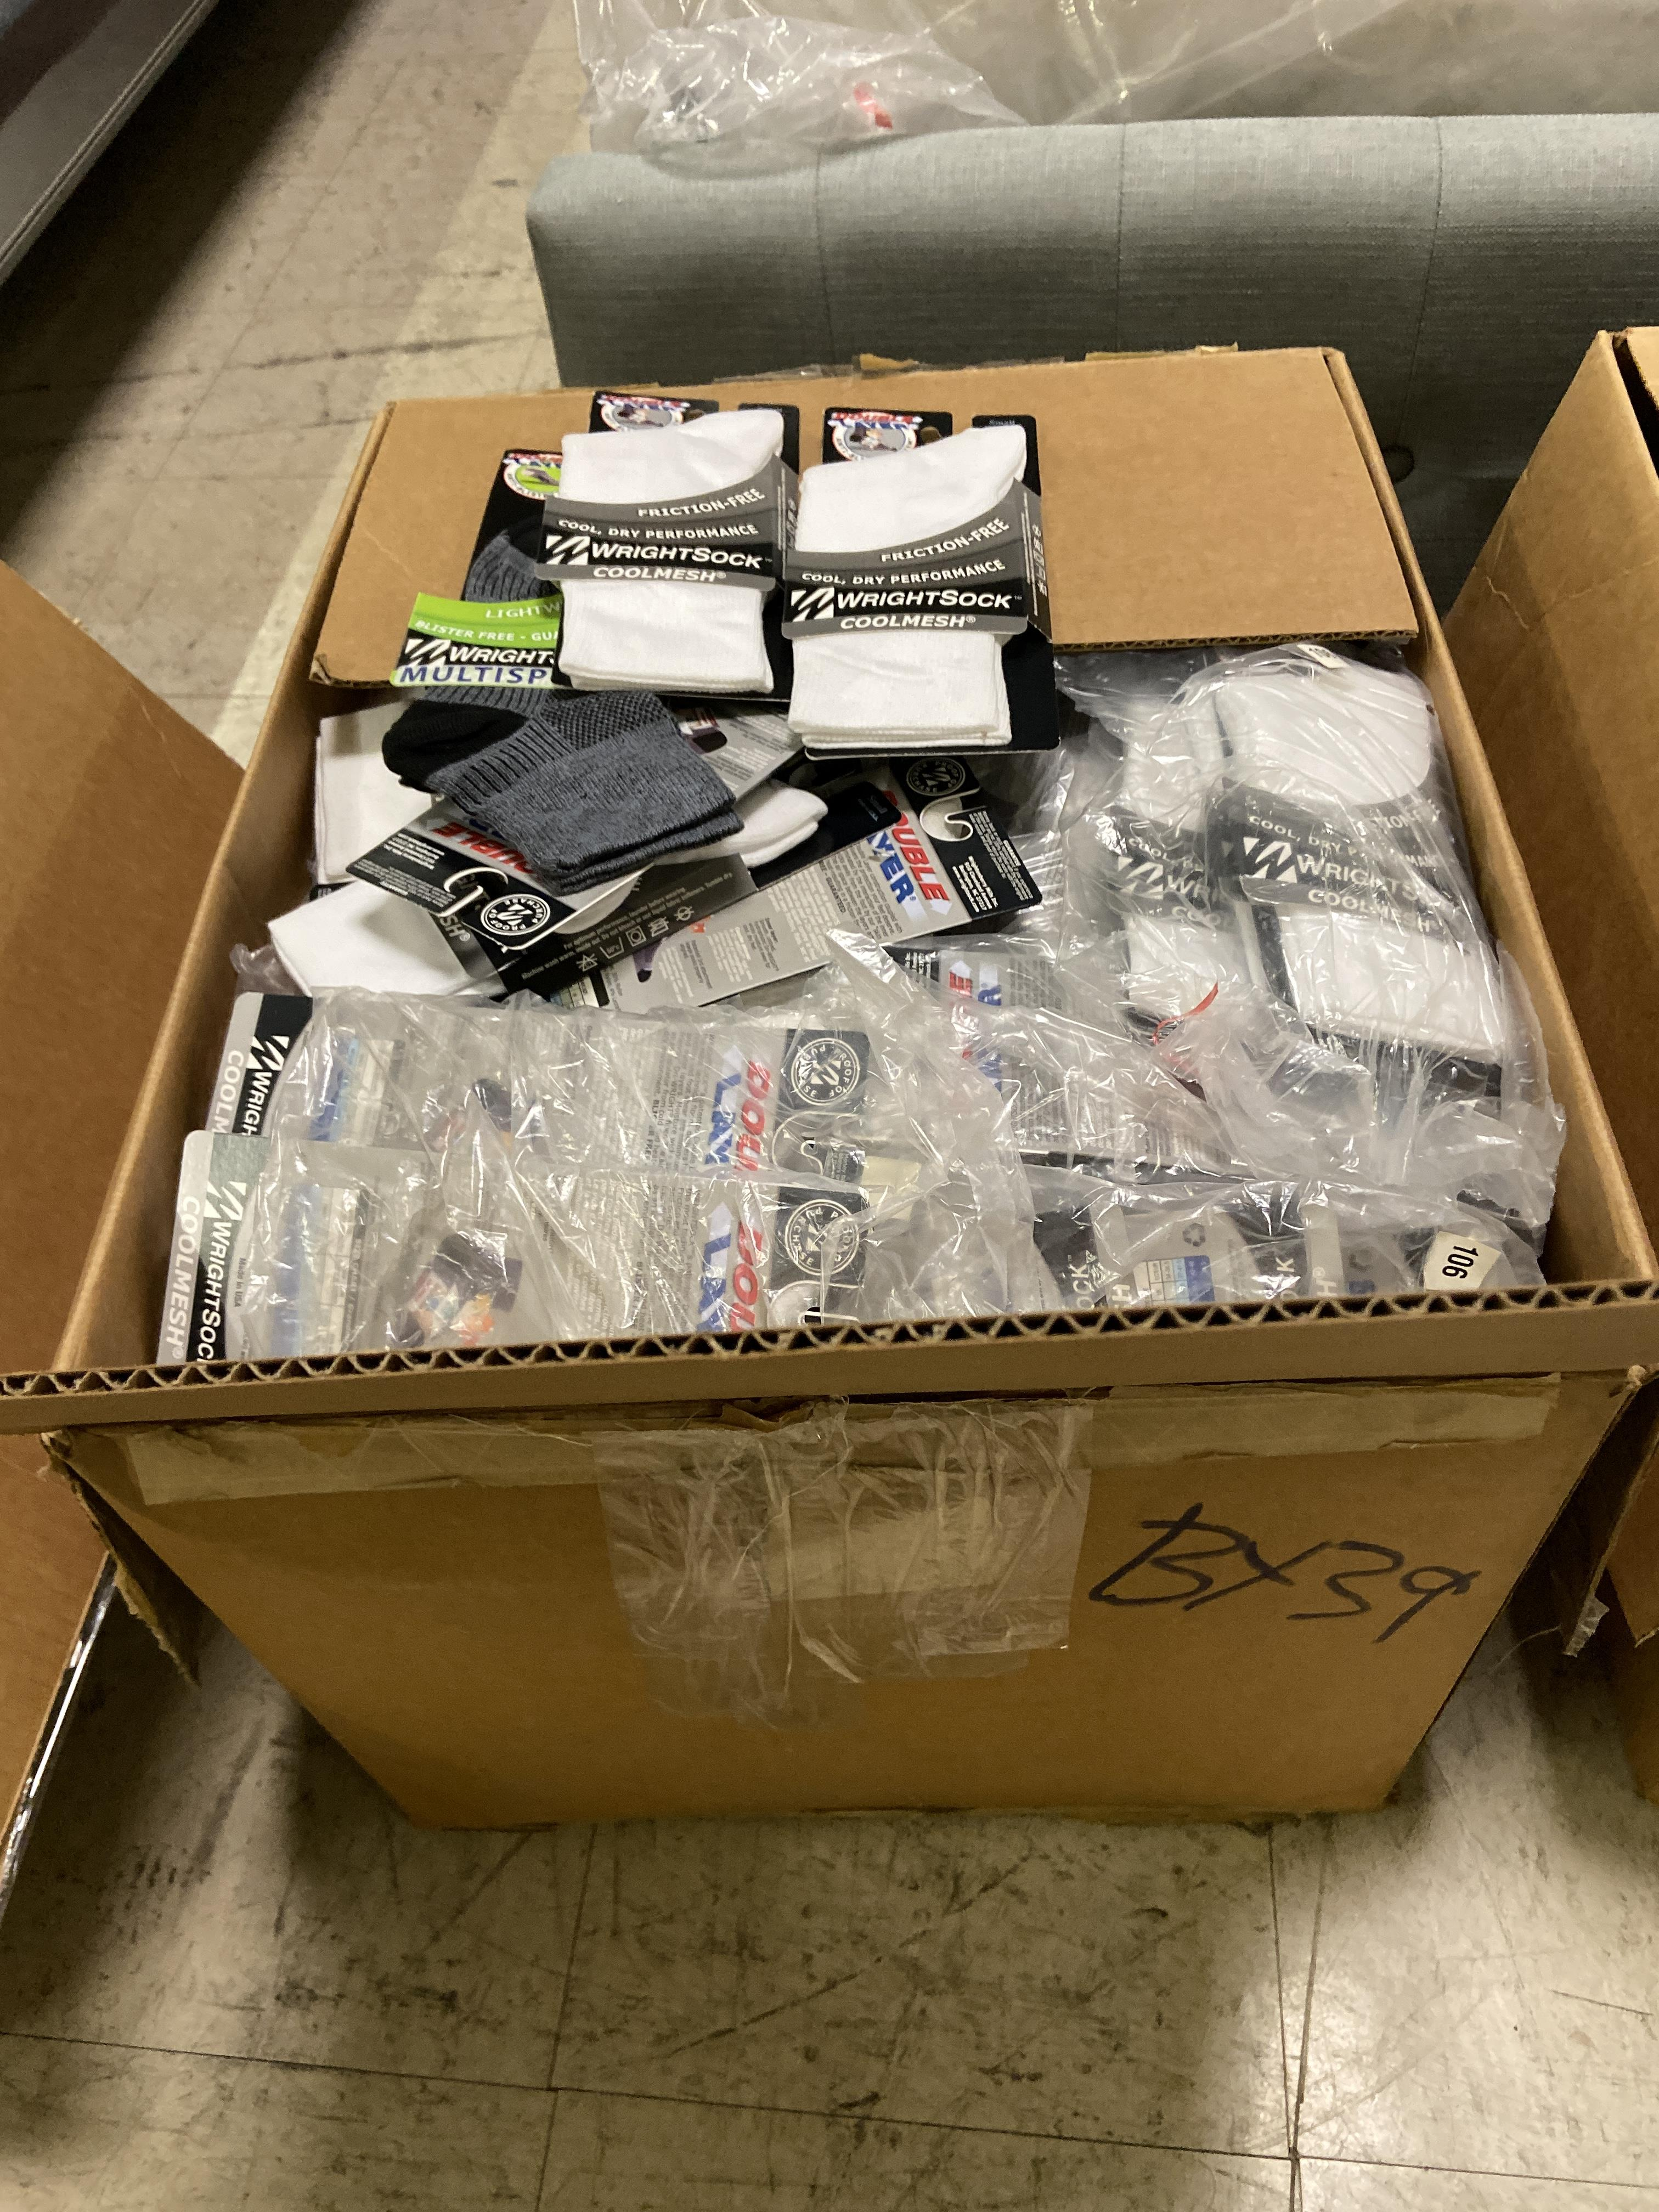 250+ packs of New Socks, Wrightsocks Coolmesh and Multisport, Various Colors